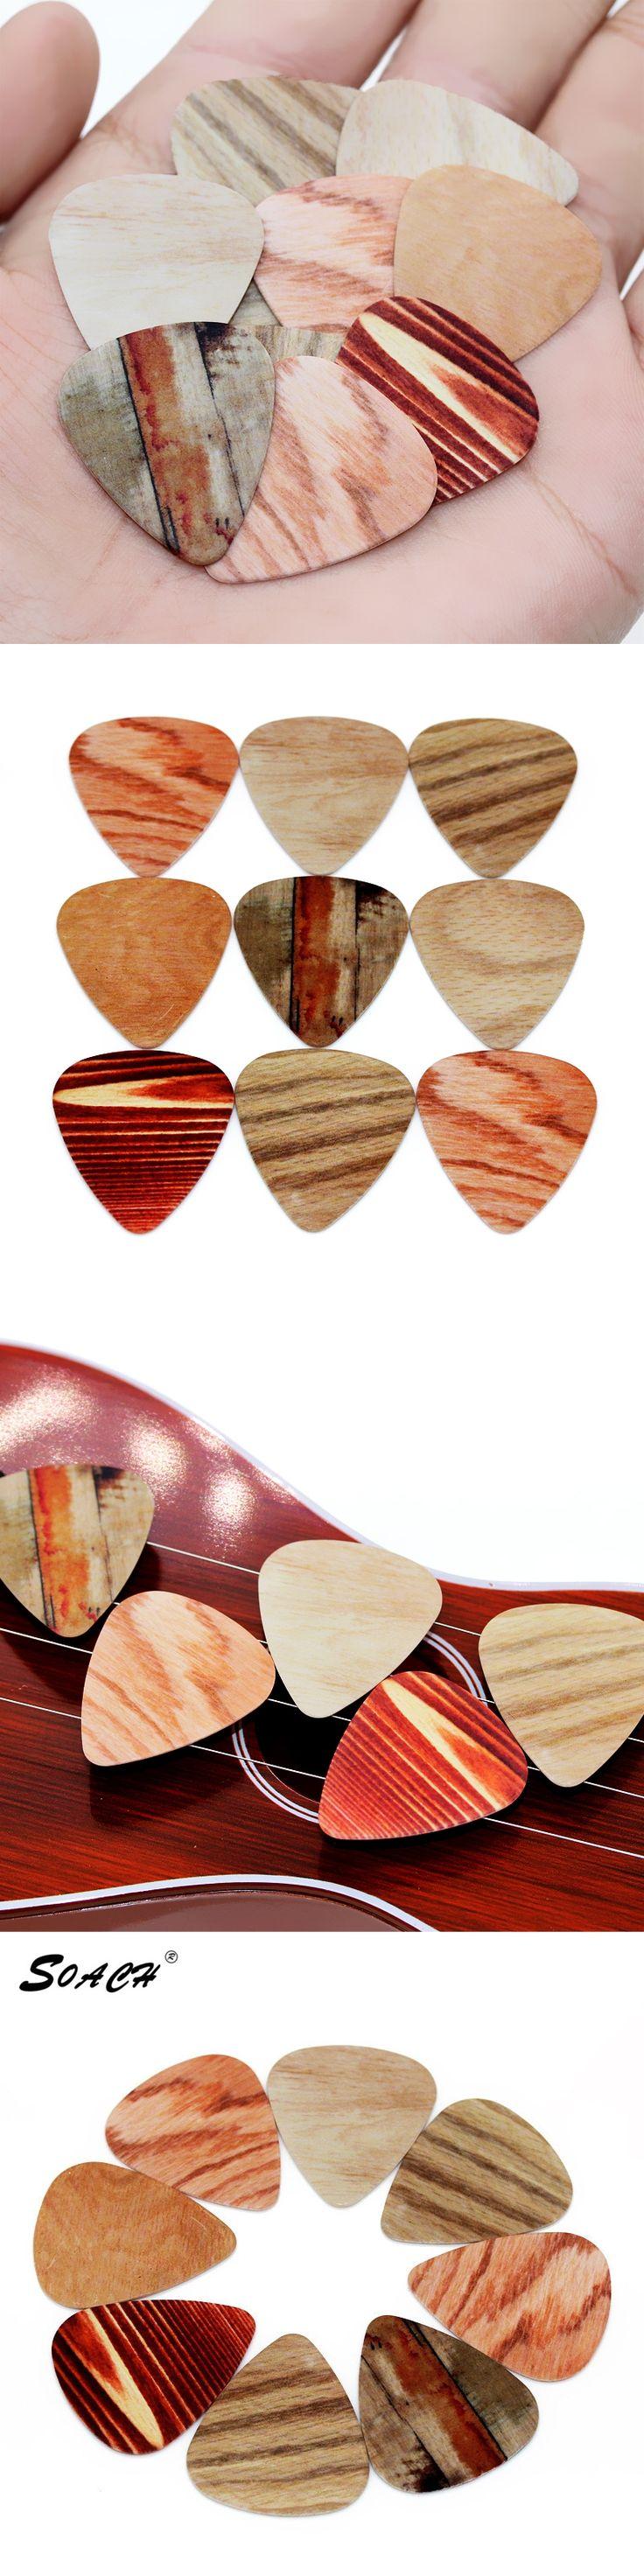 SOACH 10pcs/Lot 1.0mm thickness bass guitar picks guitar parts Selling wood grain pedal Guitarra/ukulele Accessories Strap